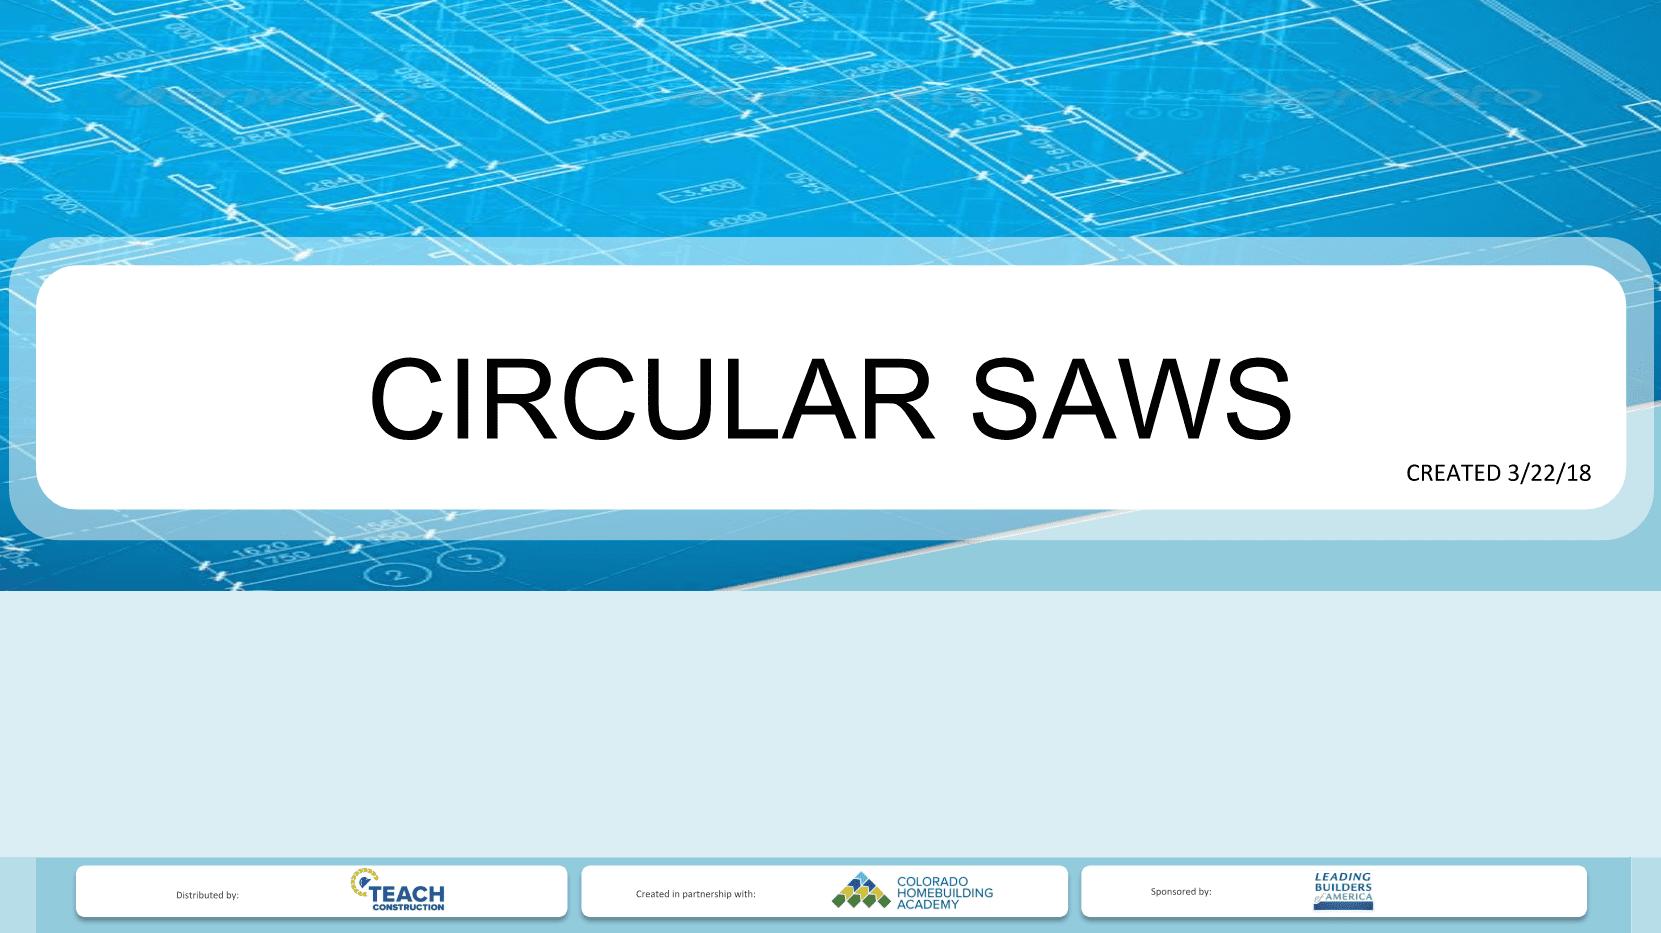 Circular Saw Presentation Image